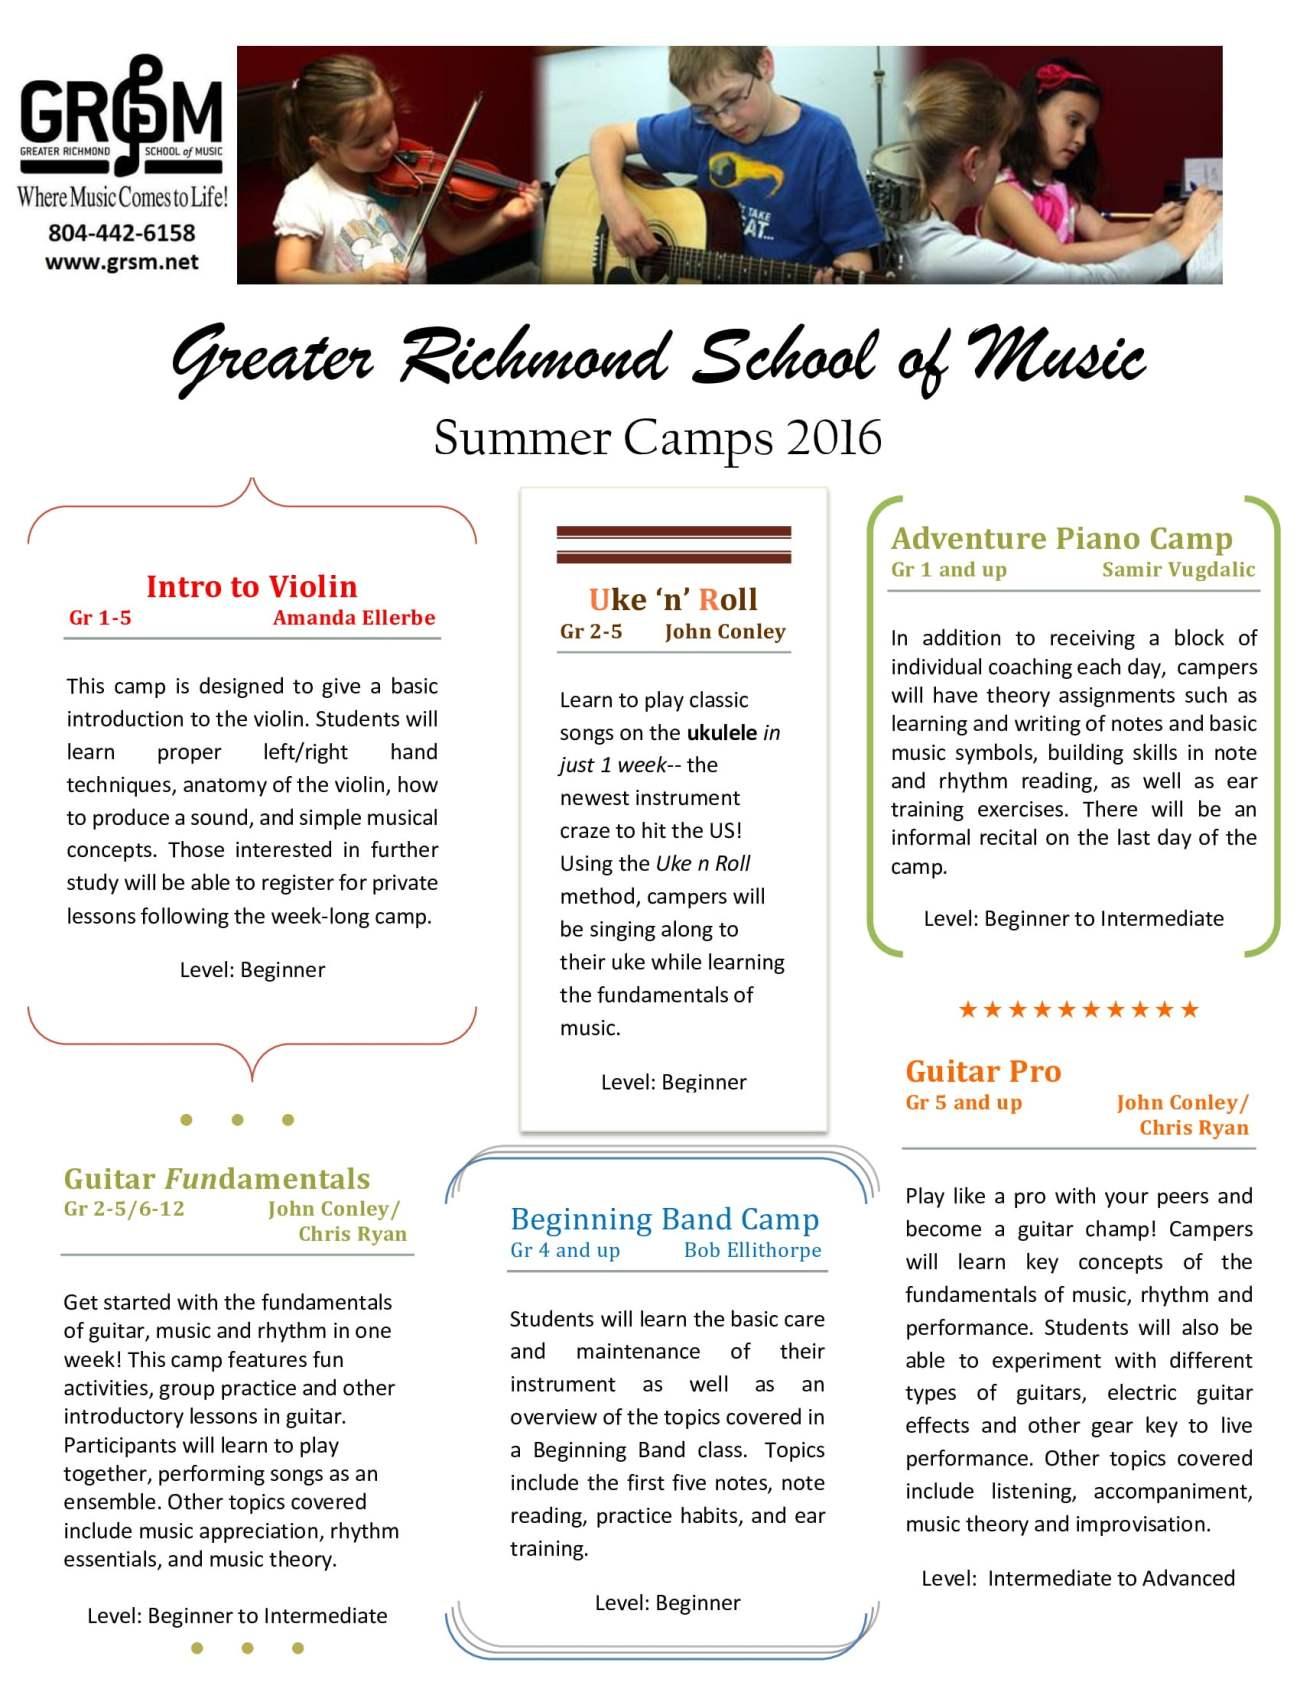 GRSM_Summer_Camps_2016_Front_